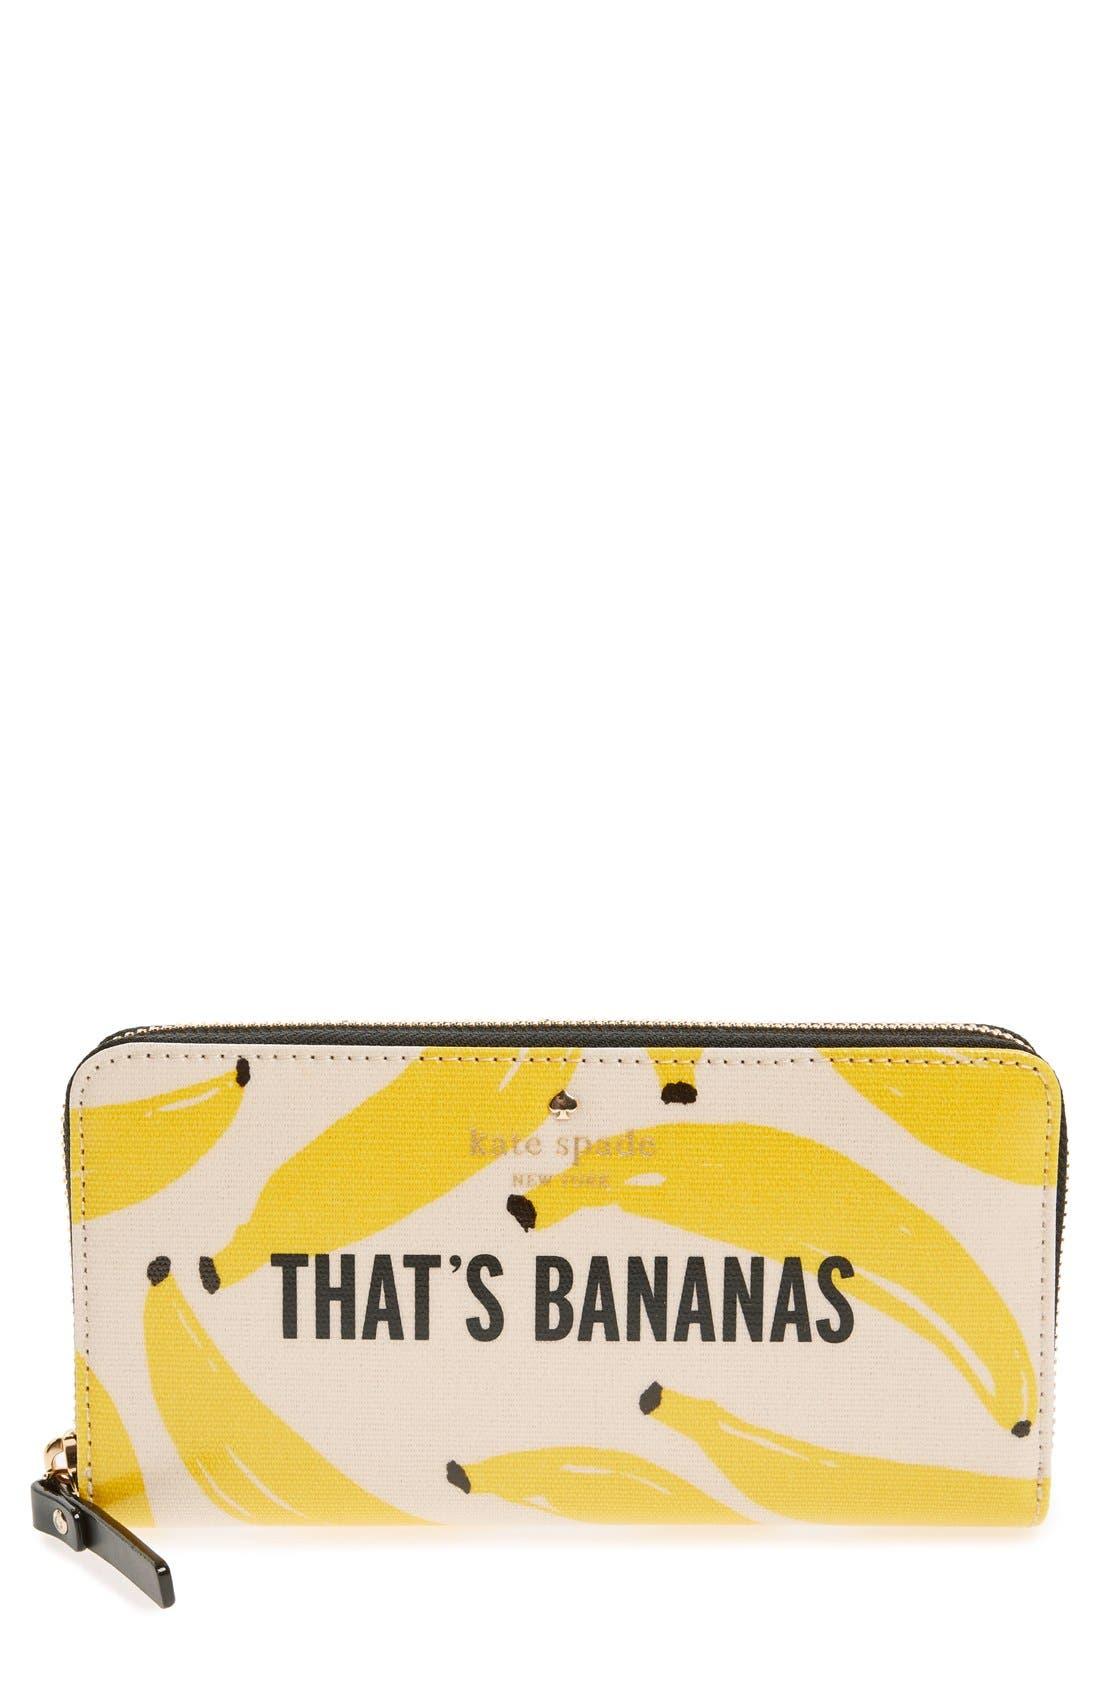 Alternate Image 1 Selected - kate spade new york 'that's bananas - lacey' zip around wallet